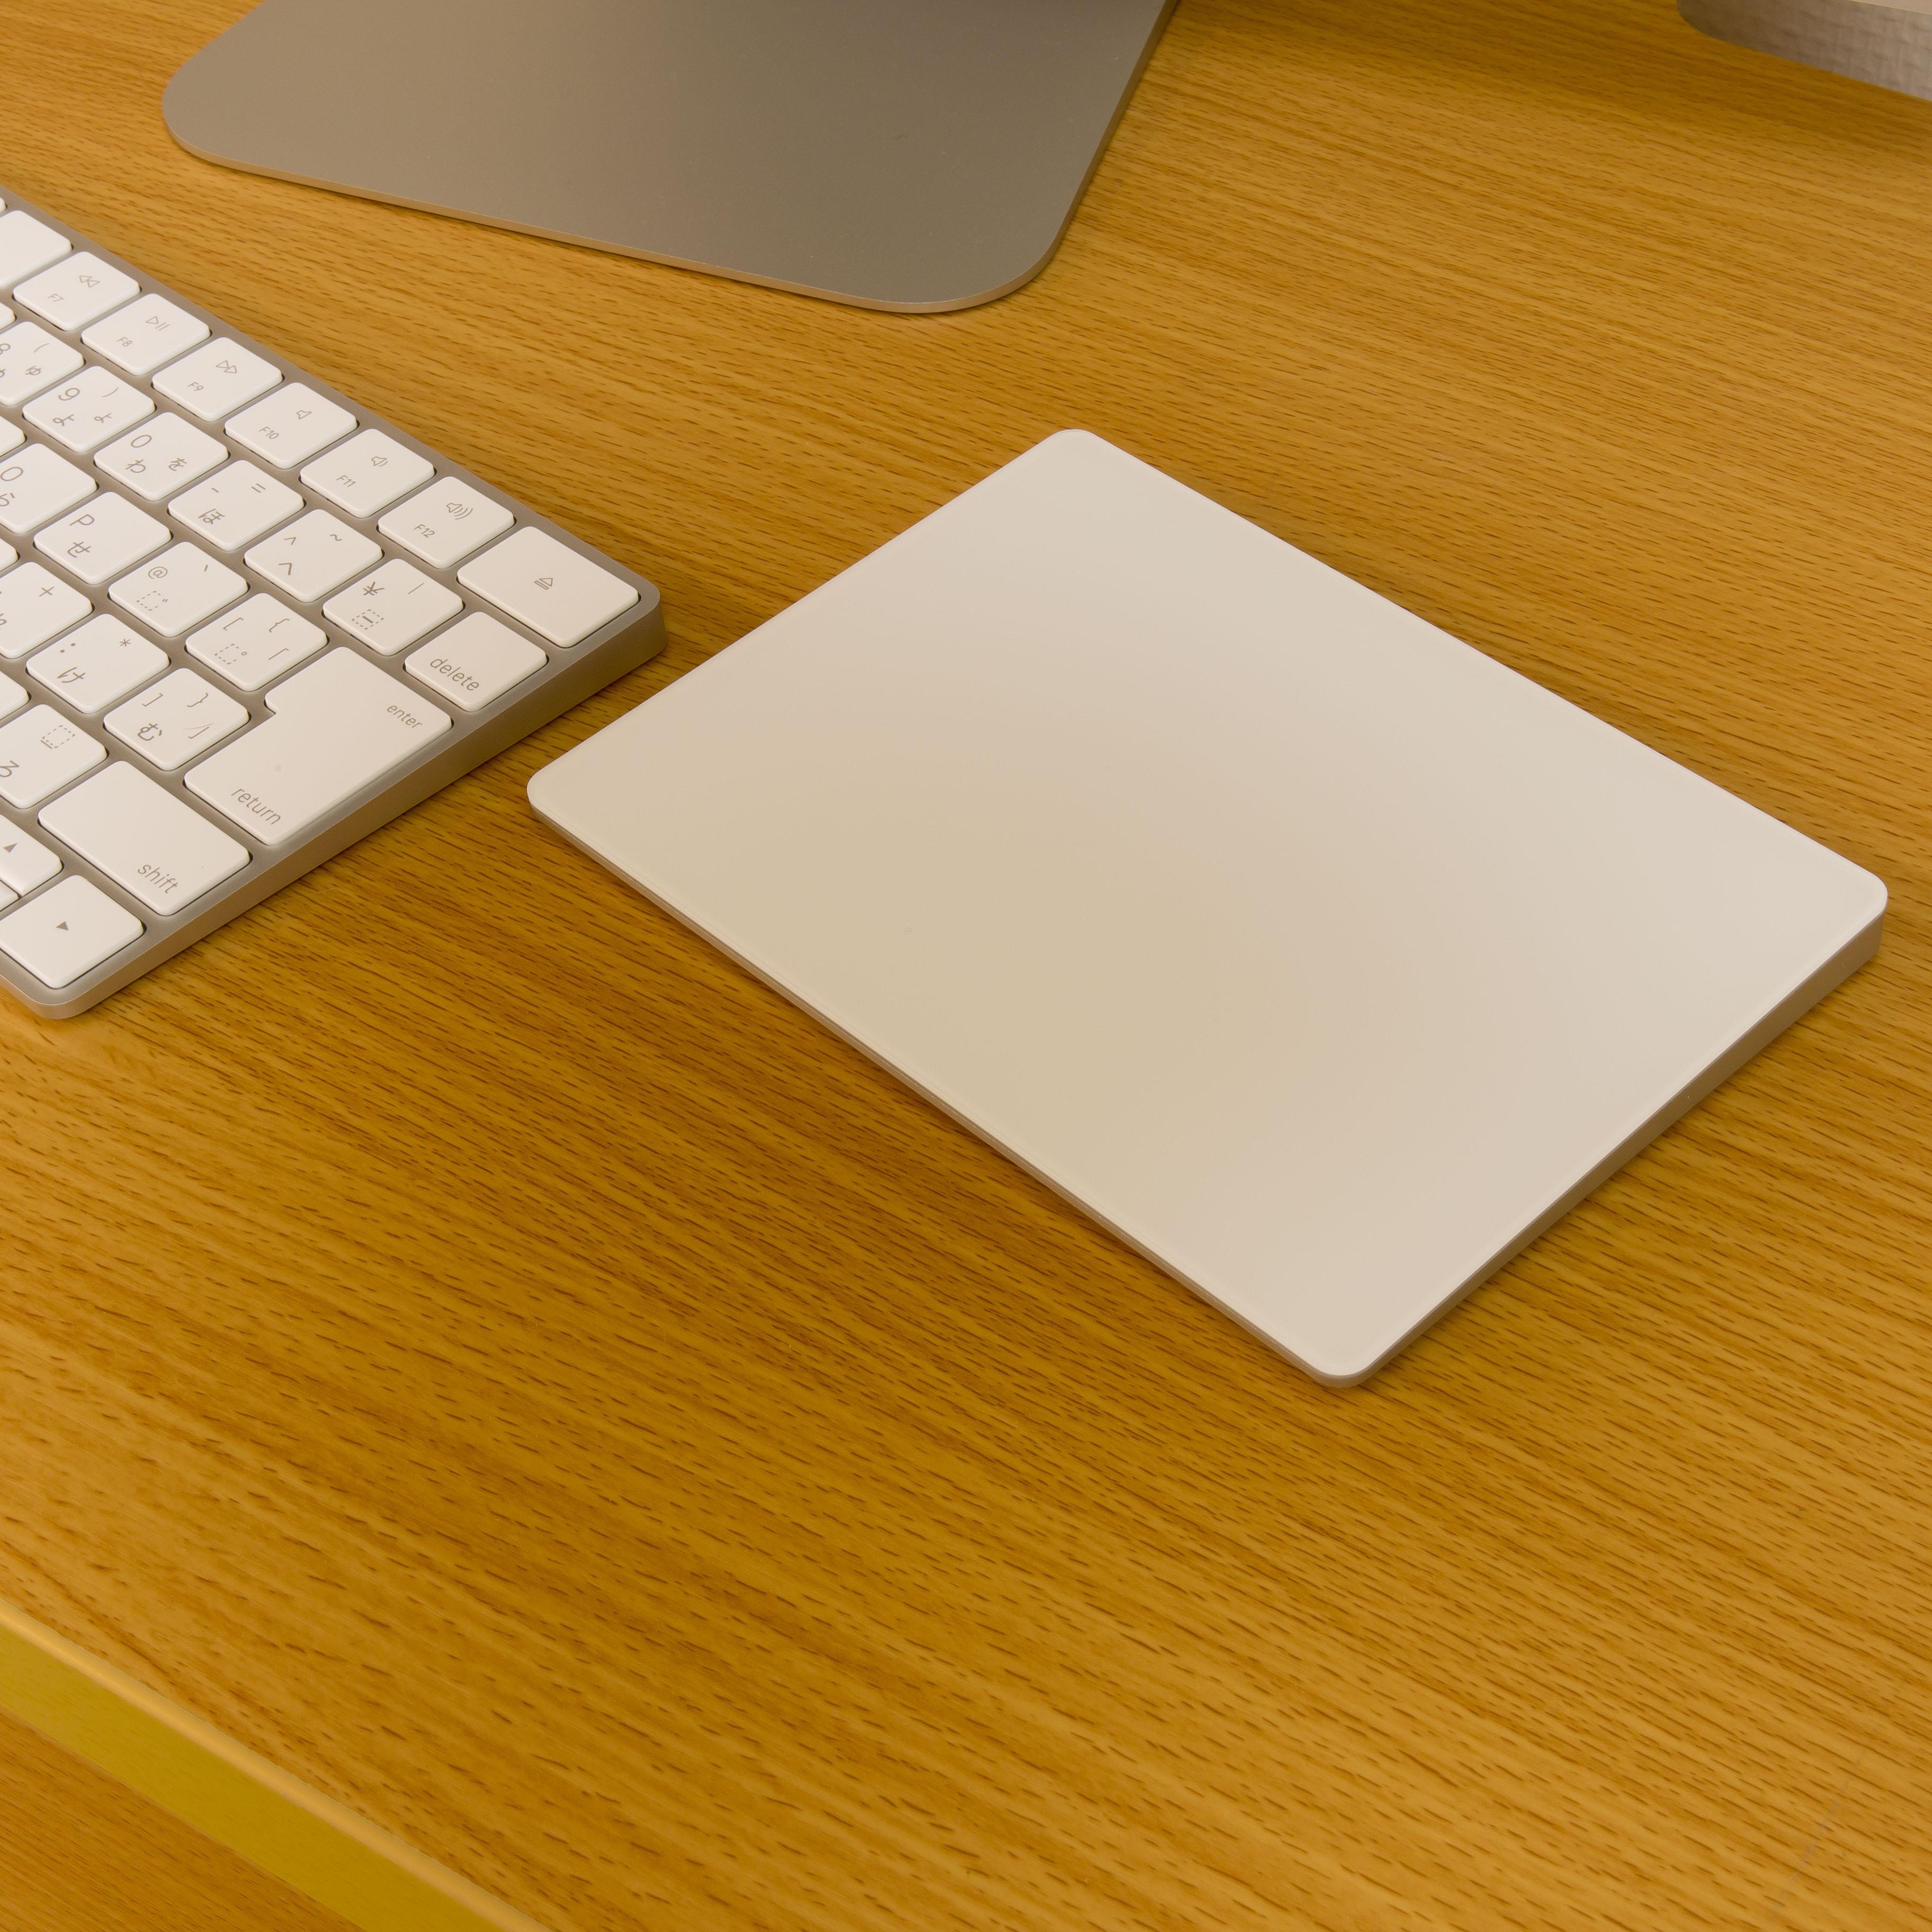 「iMac Retina 21.5インチ」購入(8)